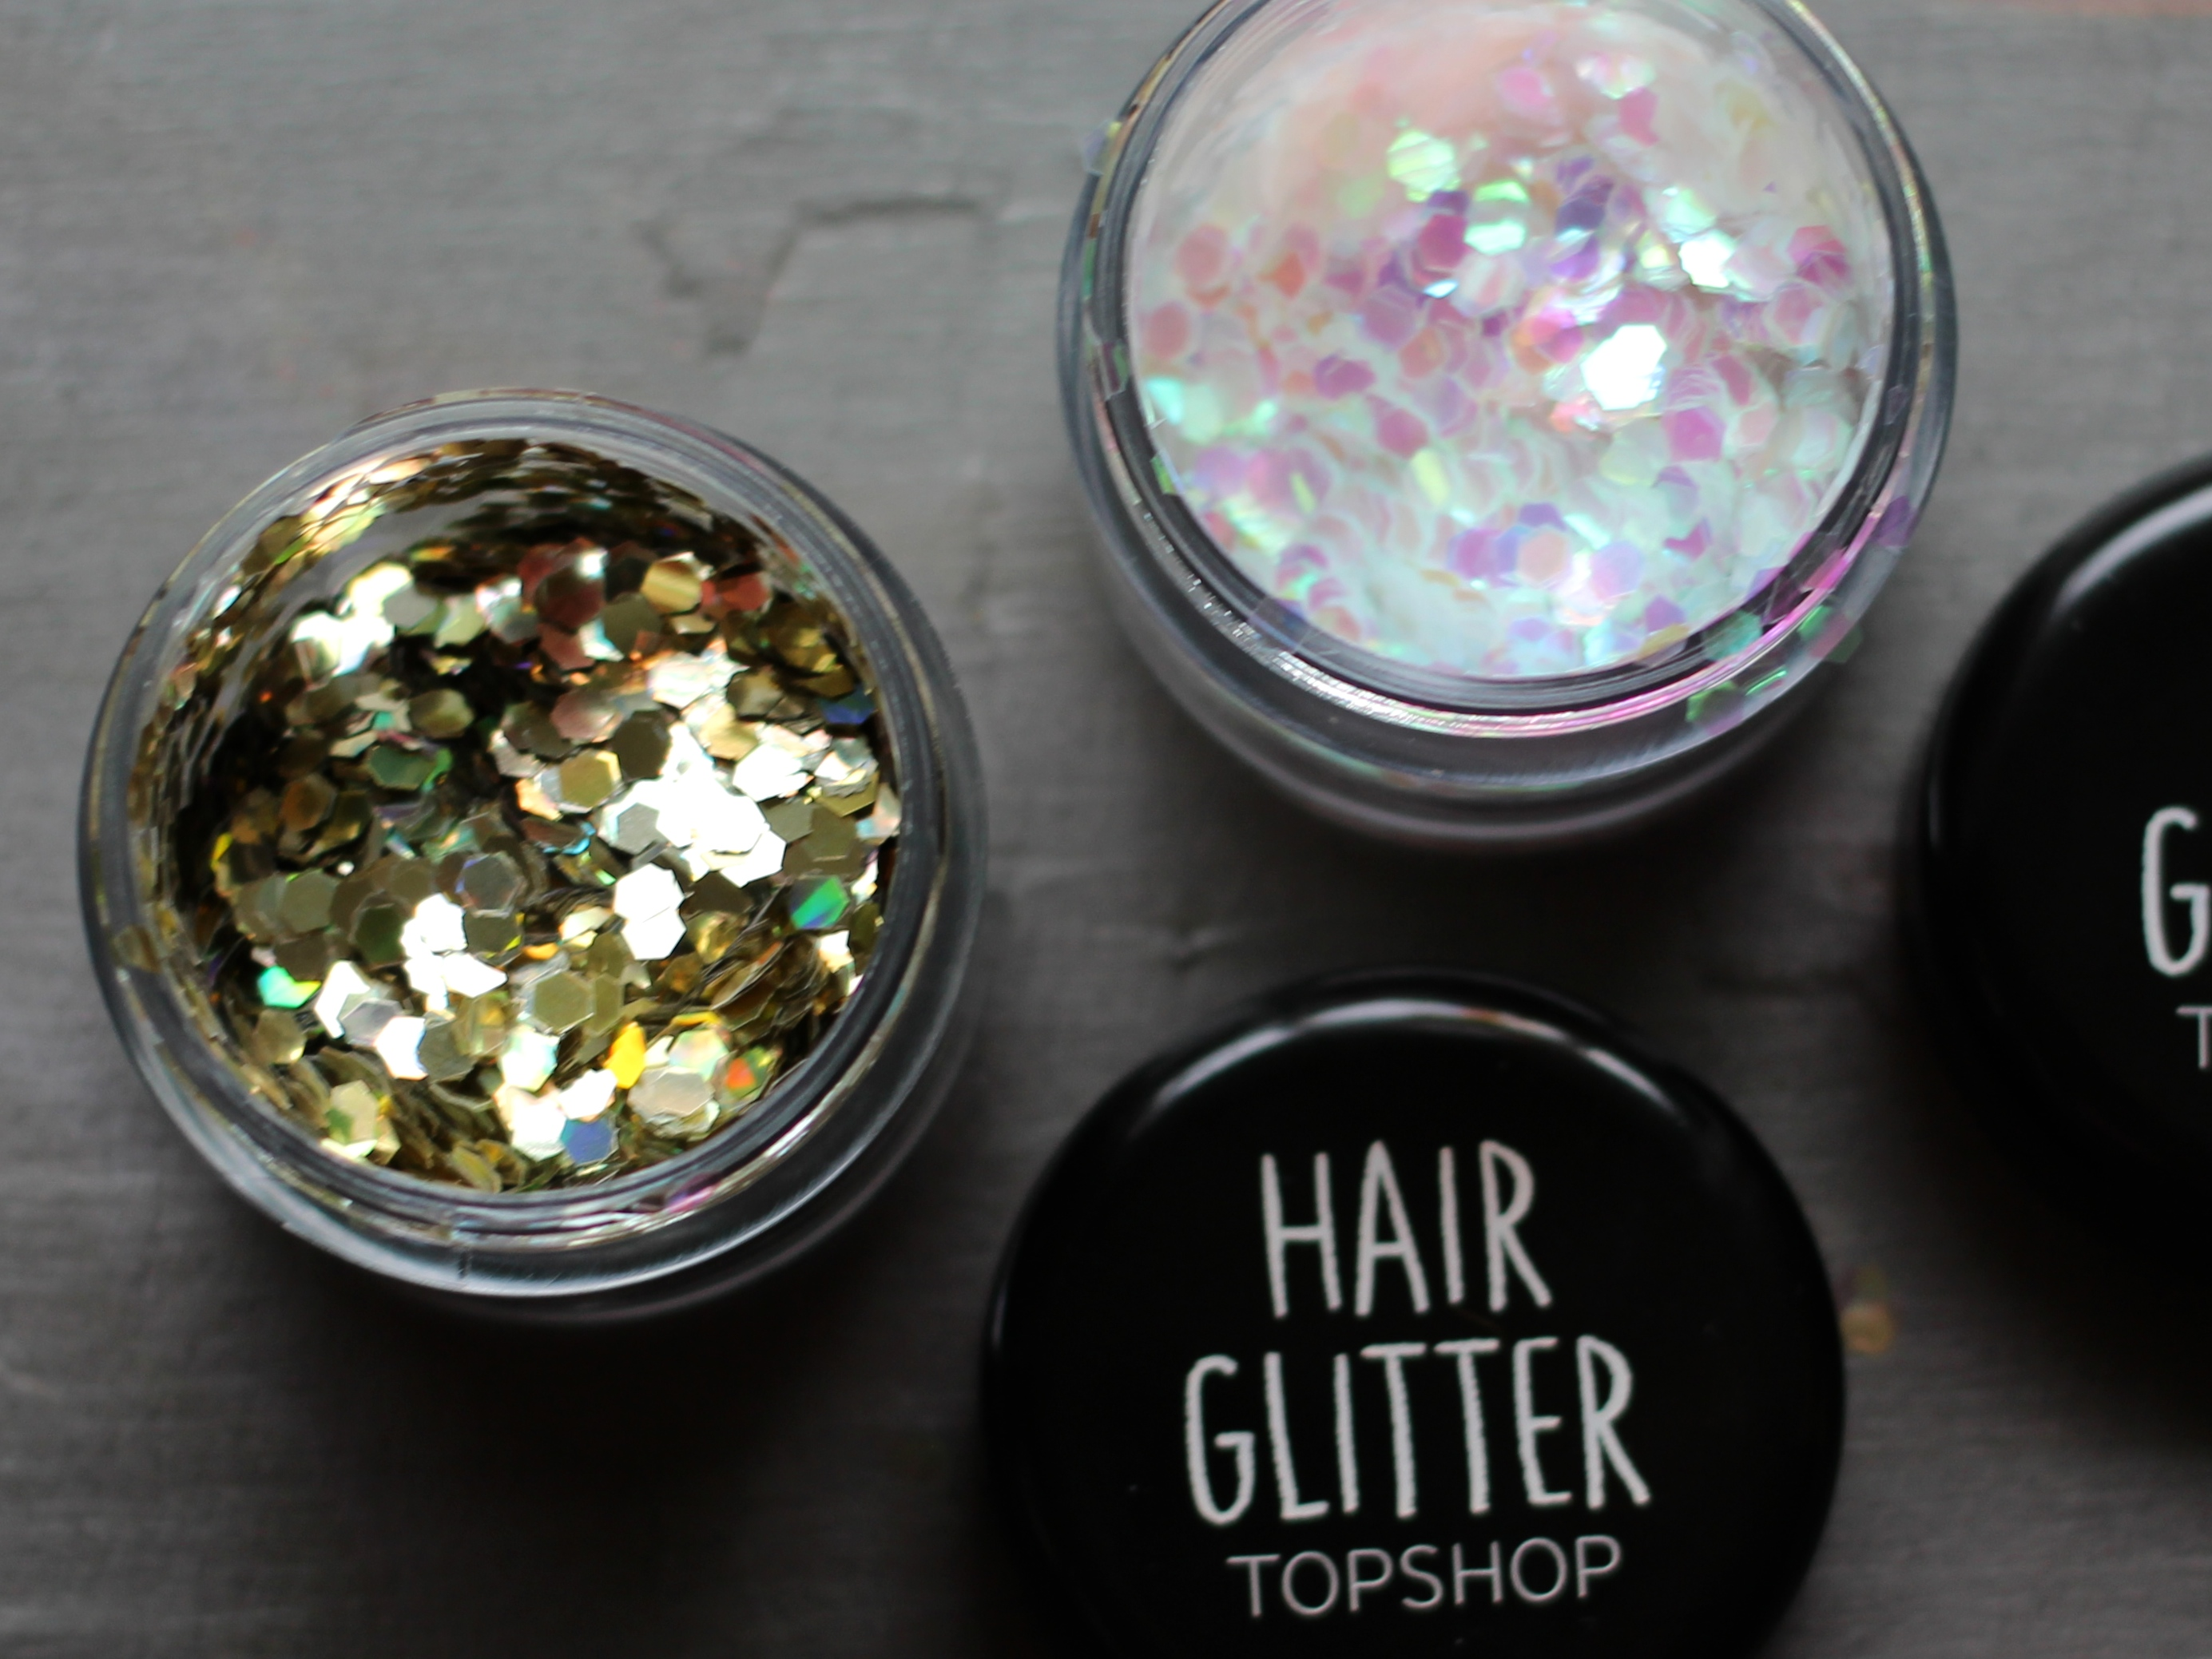 Hair Glitter Review